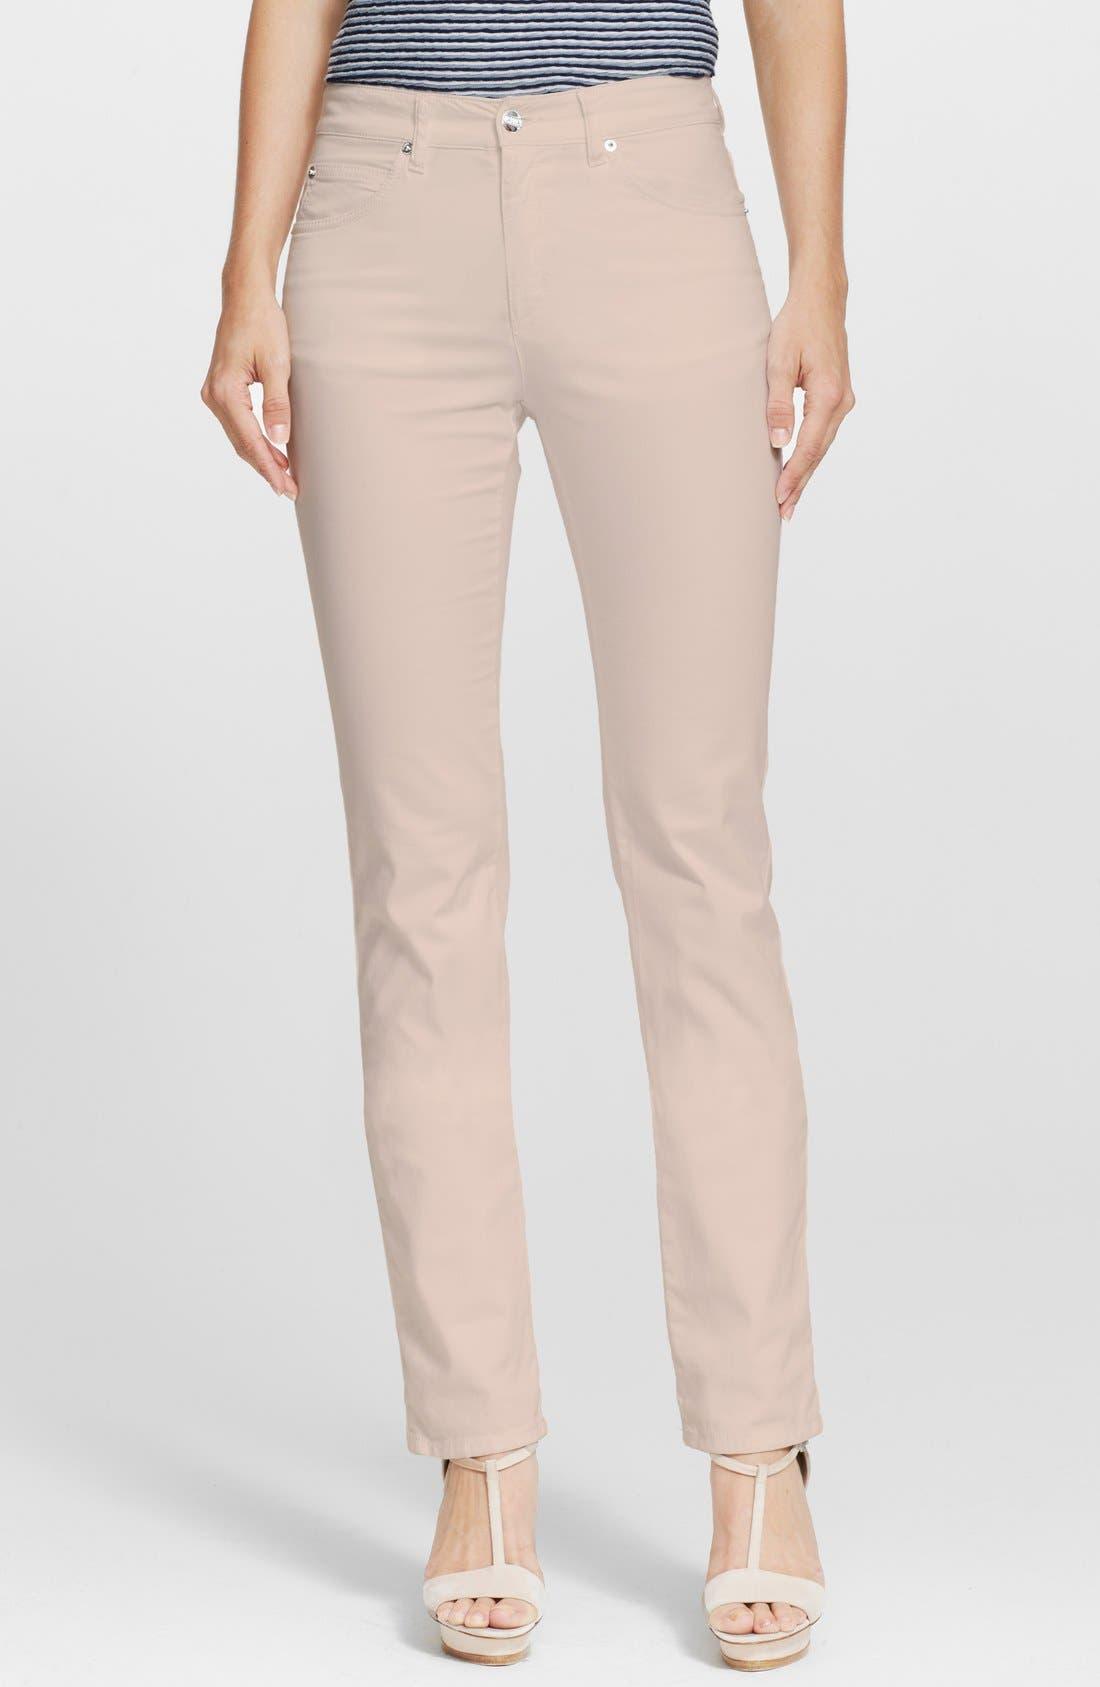 ARMANI COLLEZIONI Slim Brushed Cotton Jeans, Main, color, 272